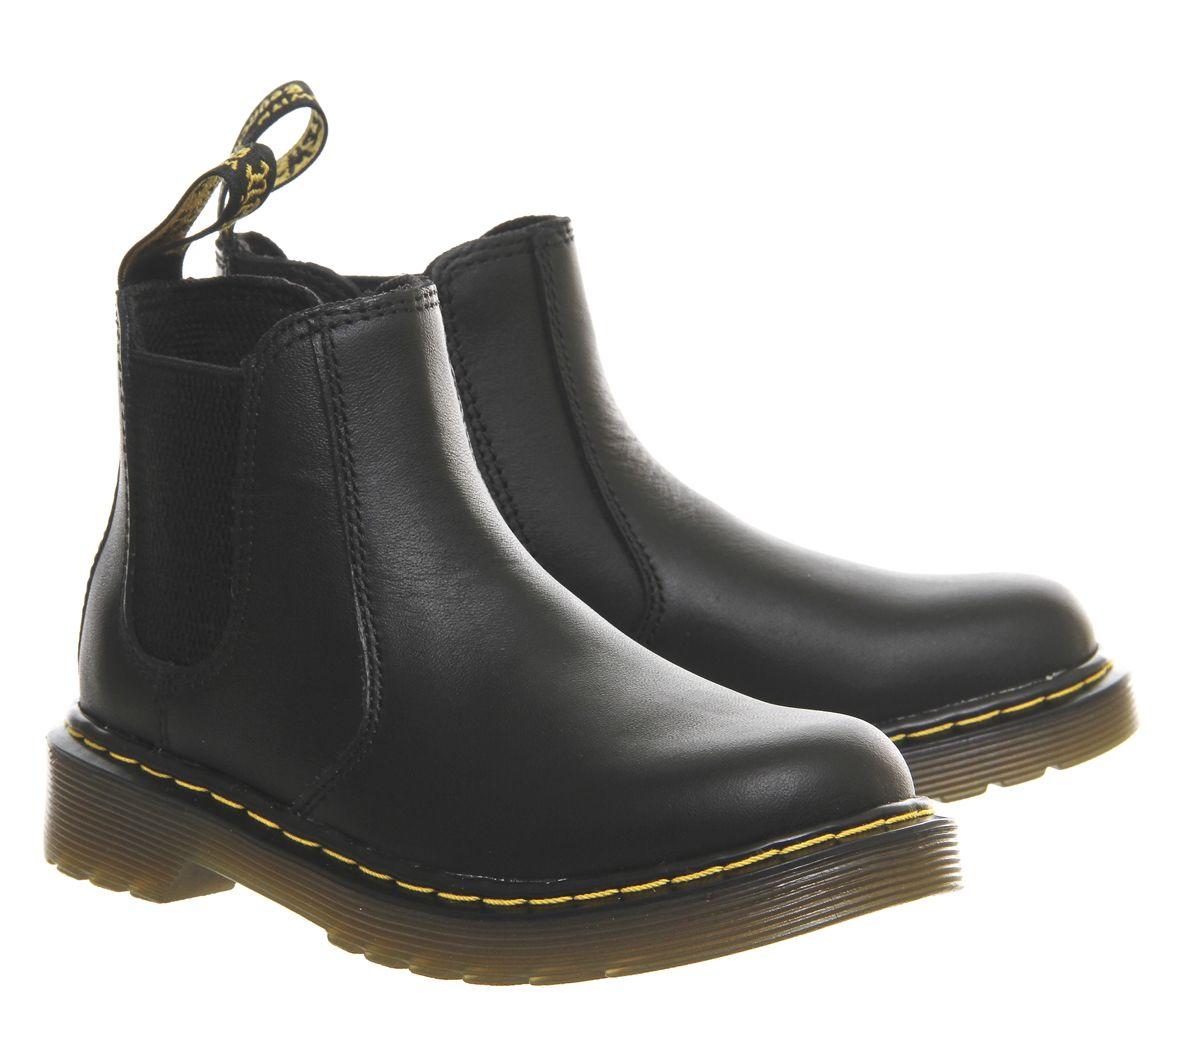 272e5a95526 Kids Dr. Martens Banzai Chelsea Boots (Junior) Black Kids